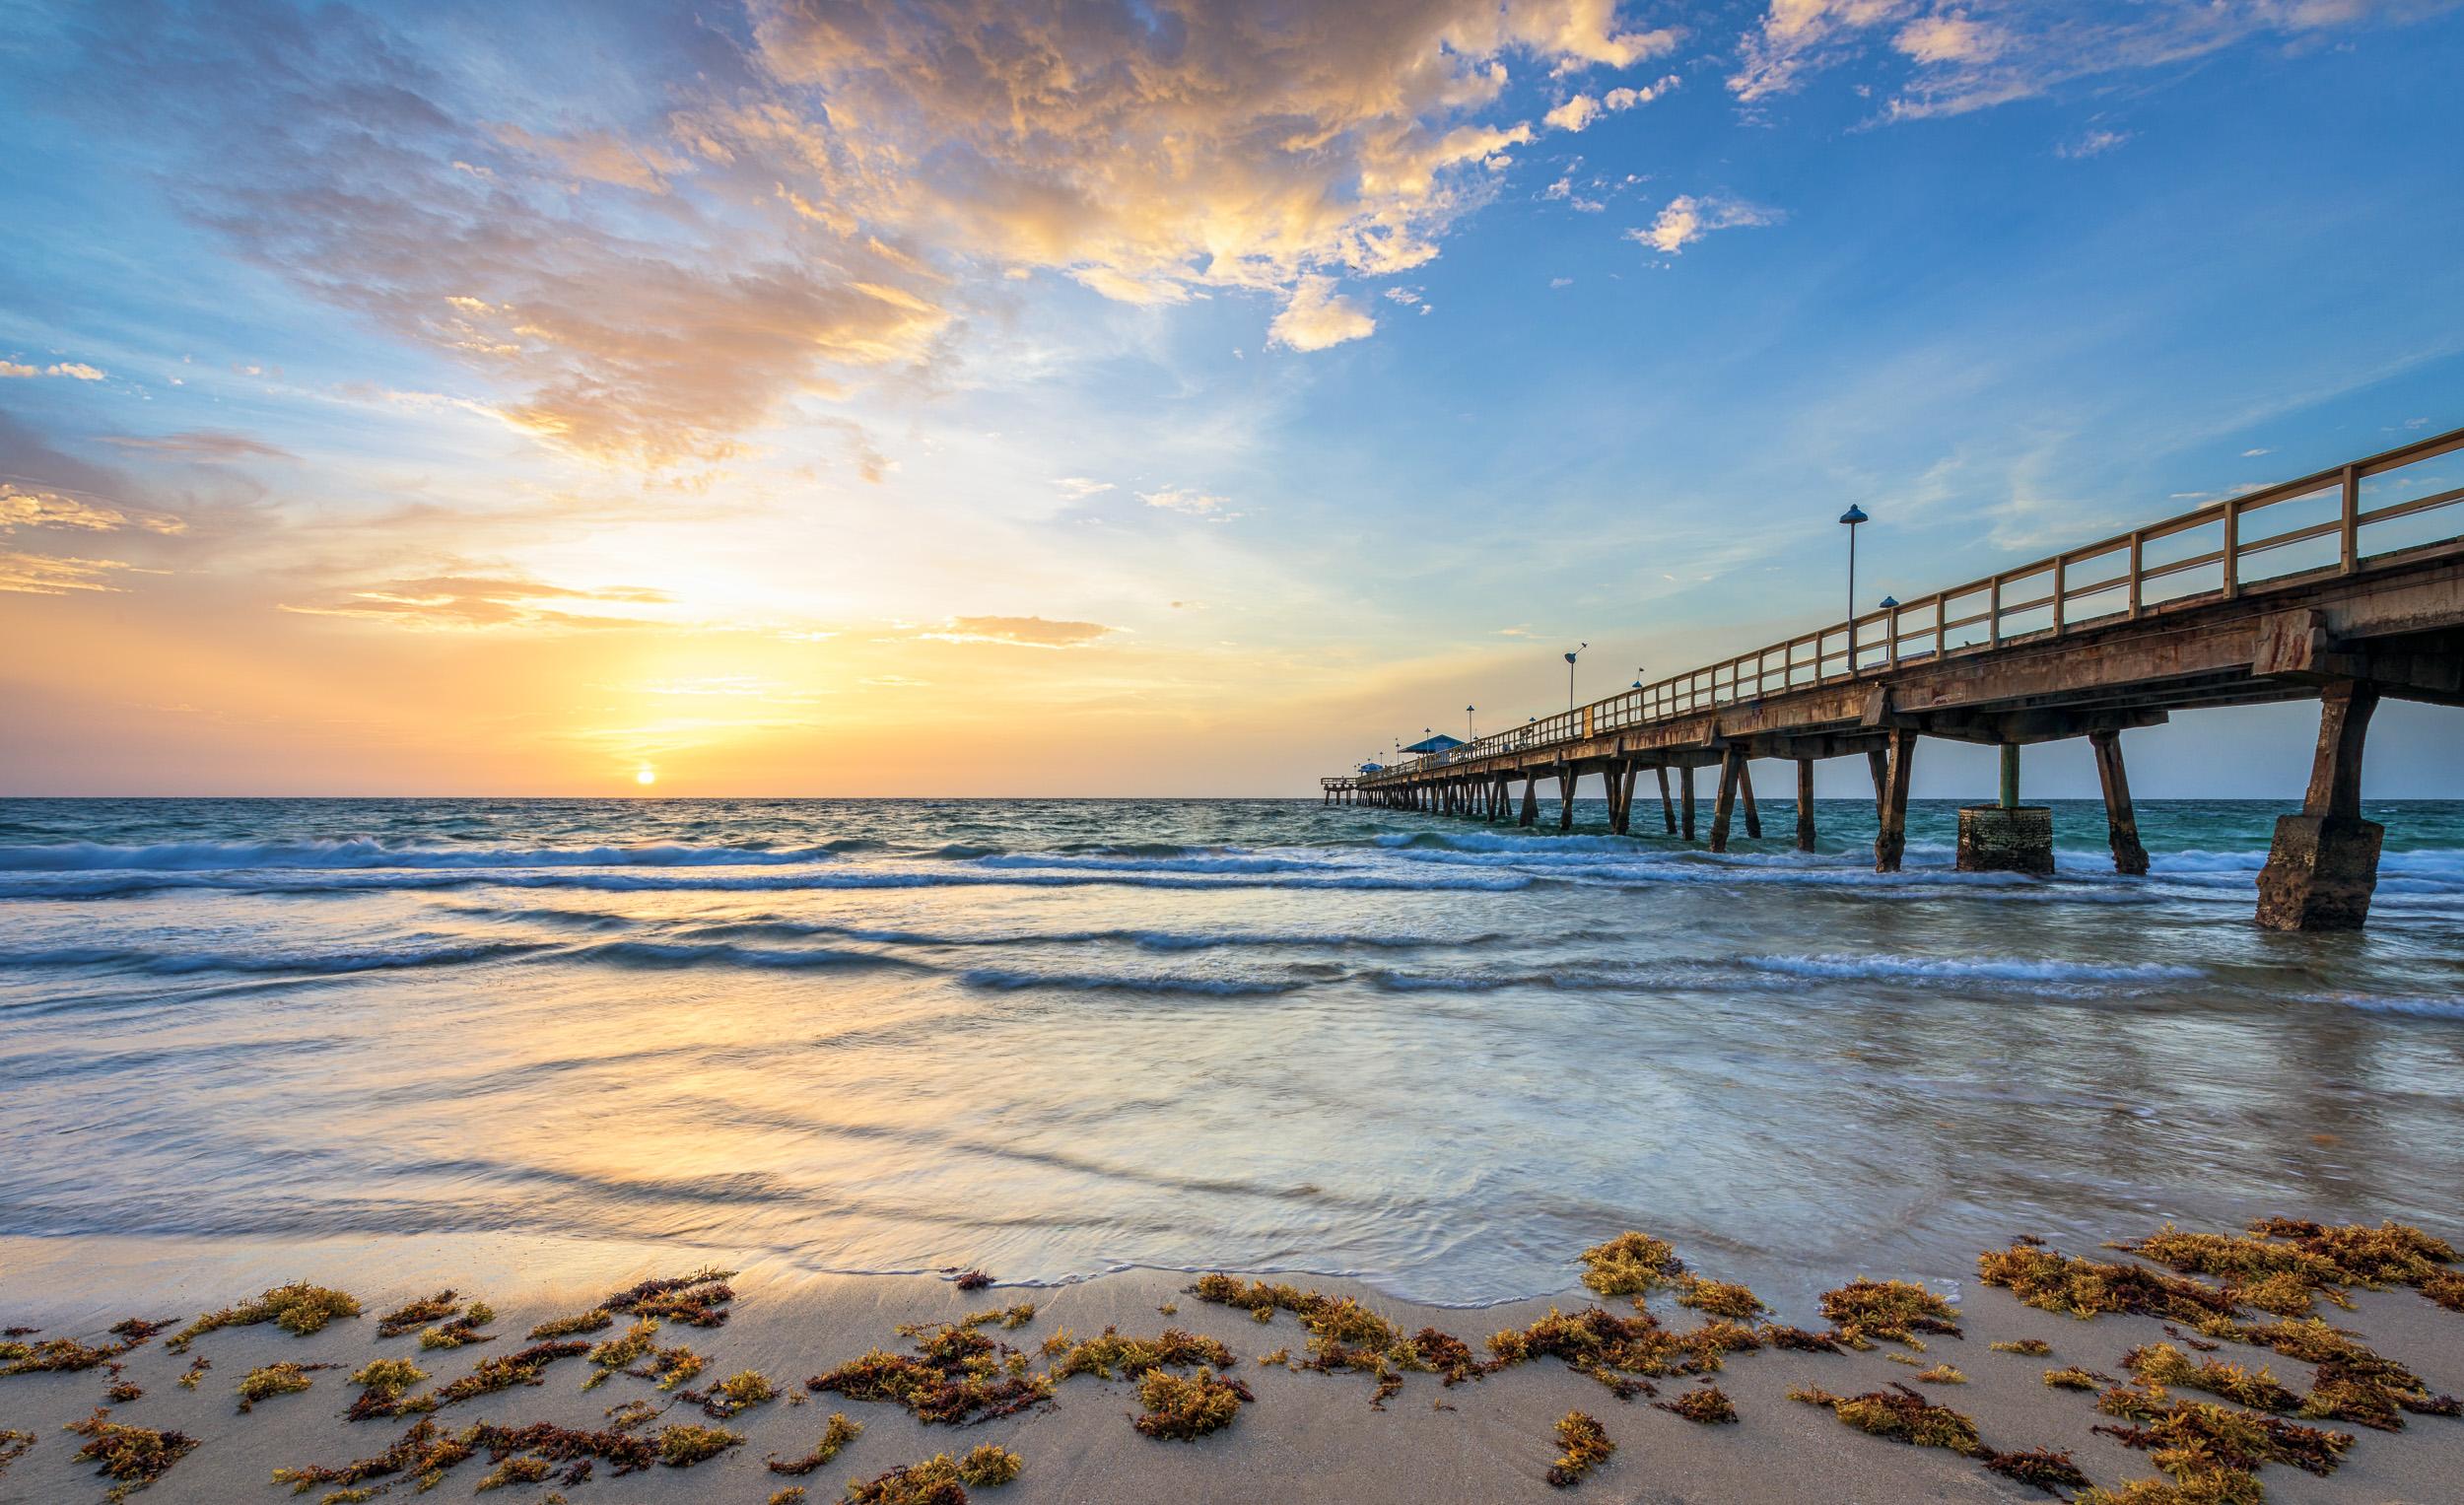 Anglins_Fishing_pier_sunrise_Miami_Fort_Lauderdale_commercial_photographer_Franklin_Castillo_2.jpg